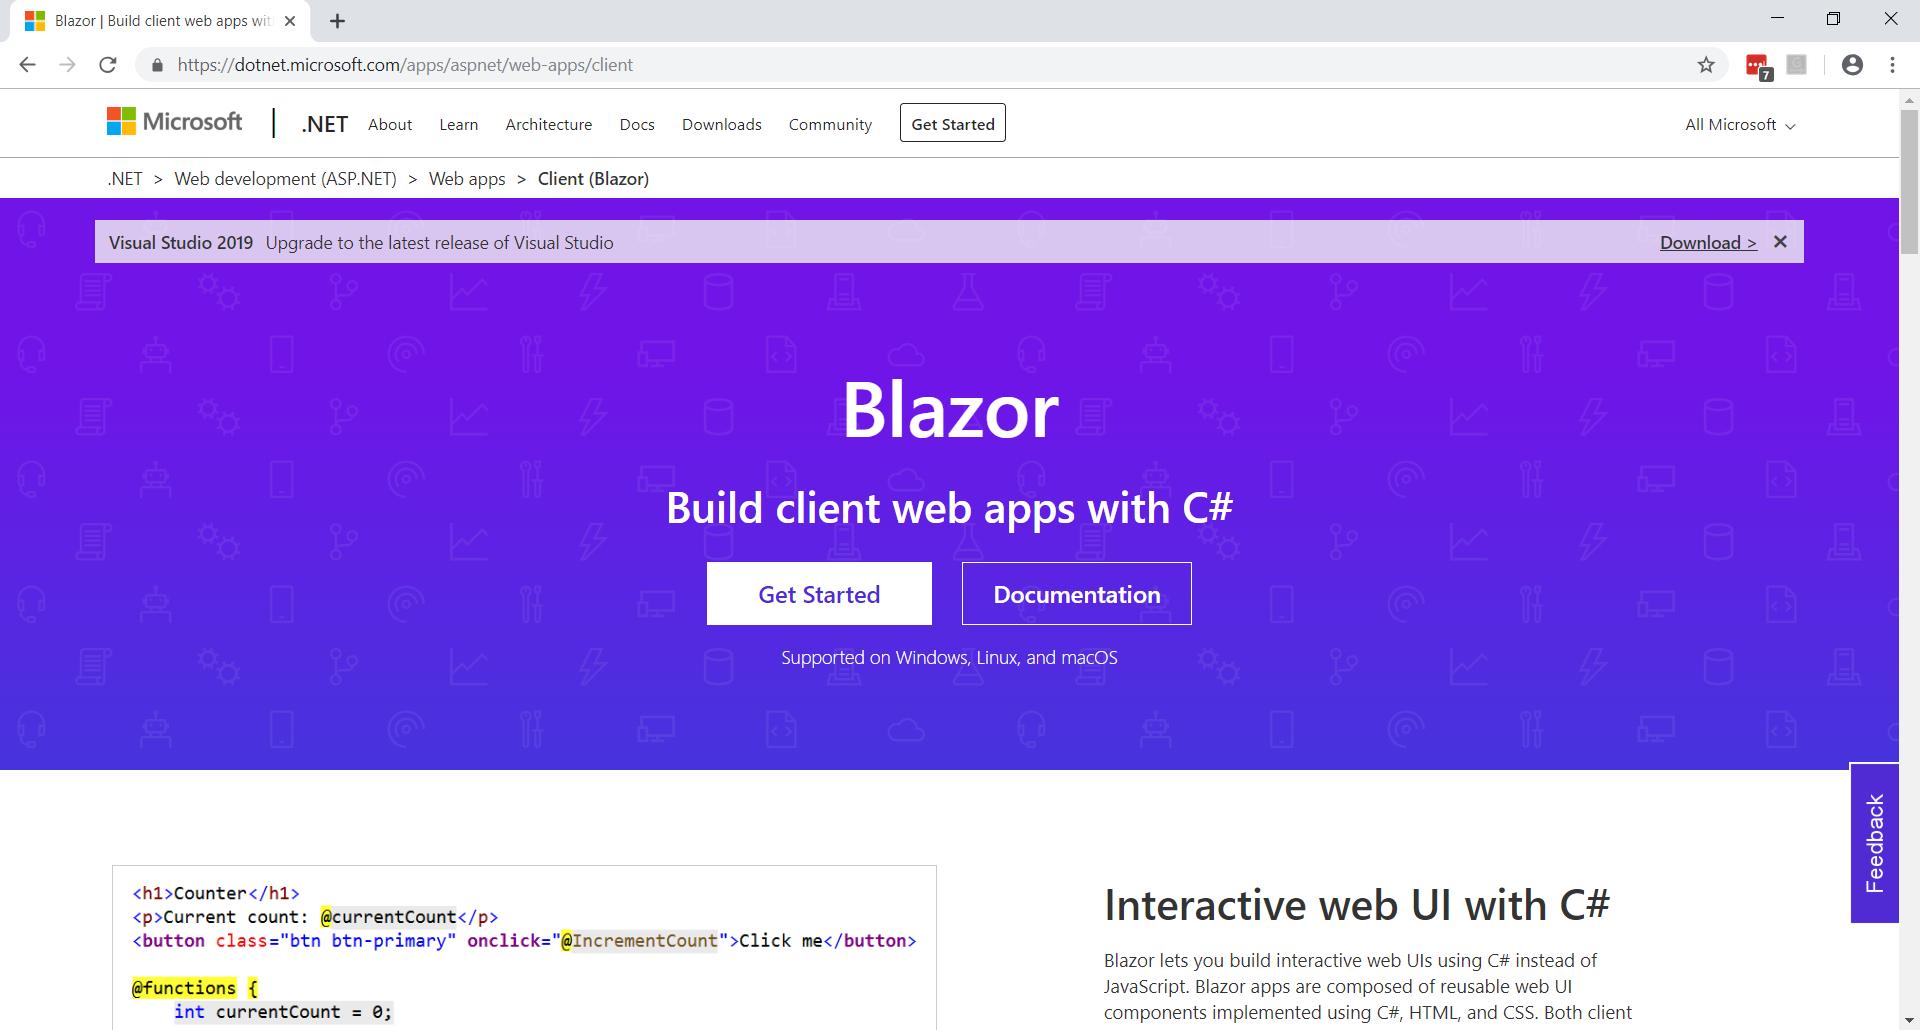 Blazor home page